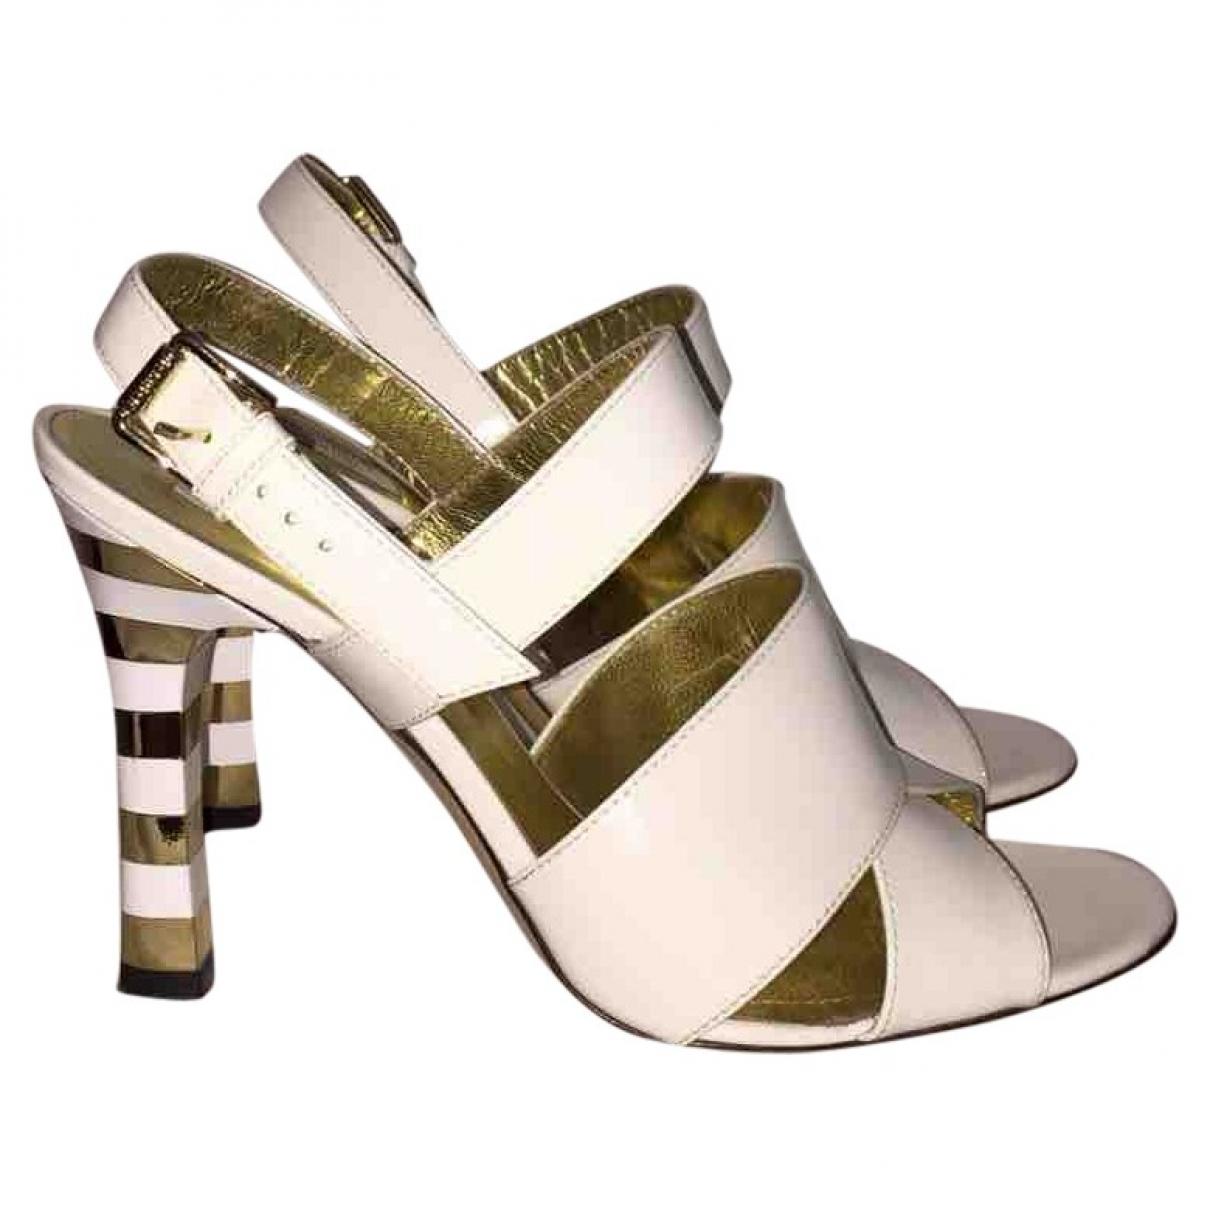 Max Mara \N White Patent leather Sandals for Women 38 EU